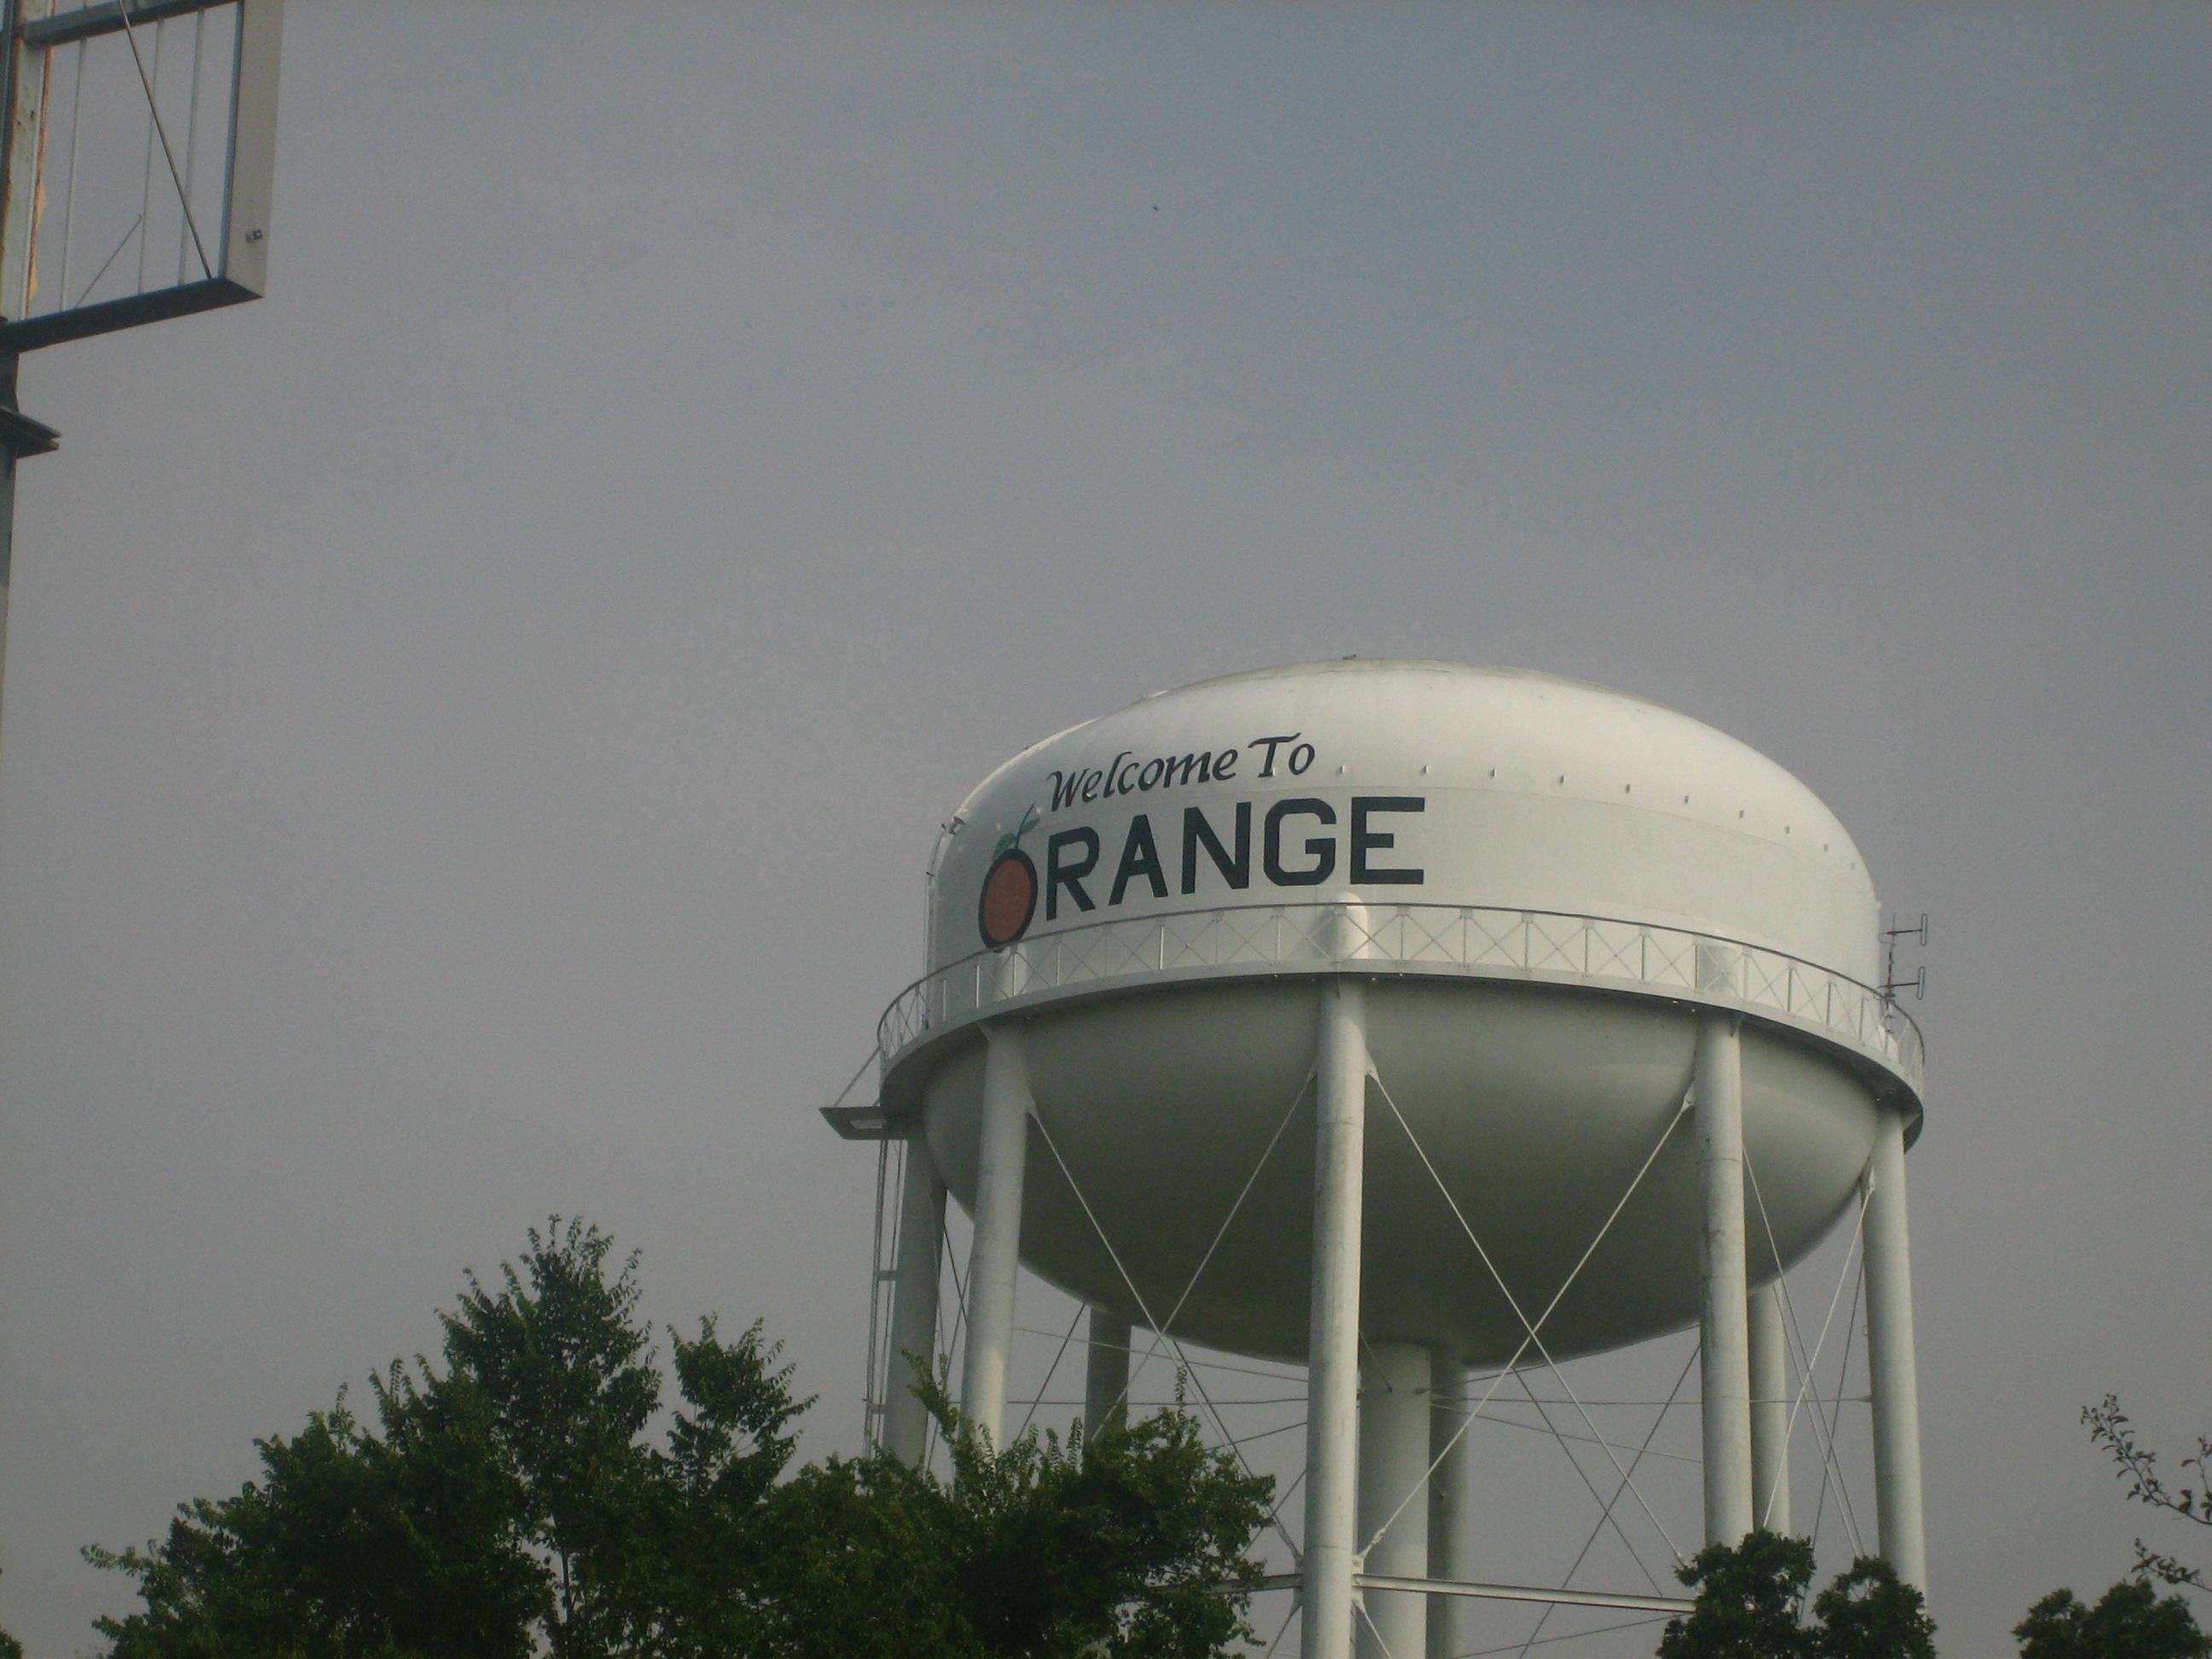 Water tower in Orange, Texas